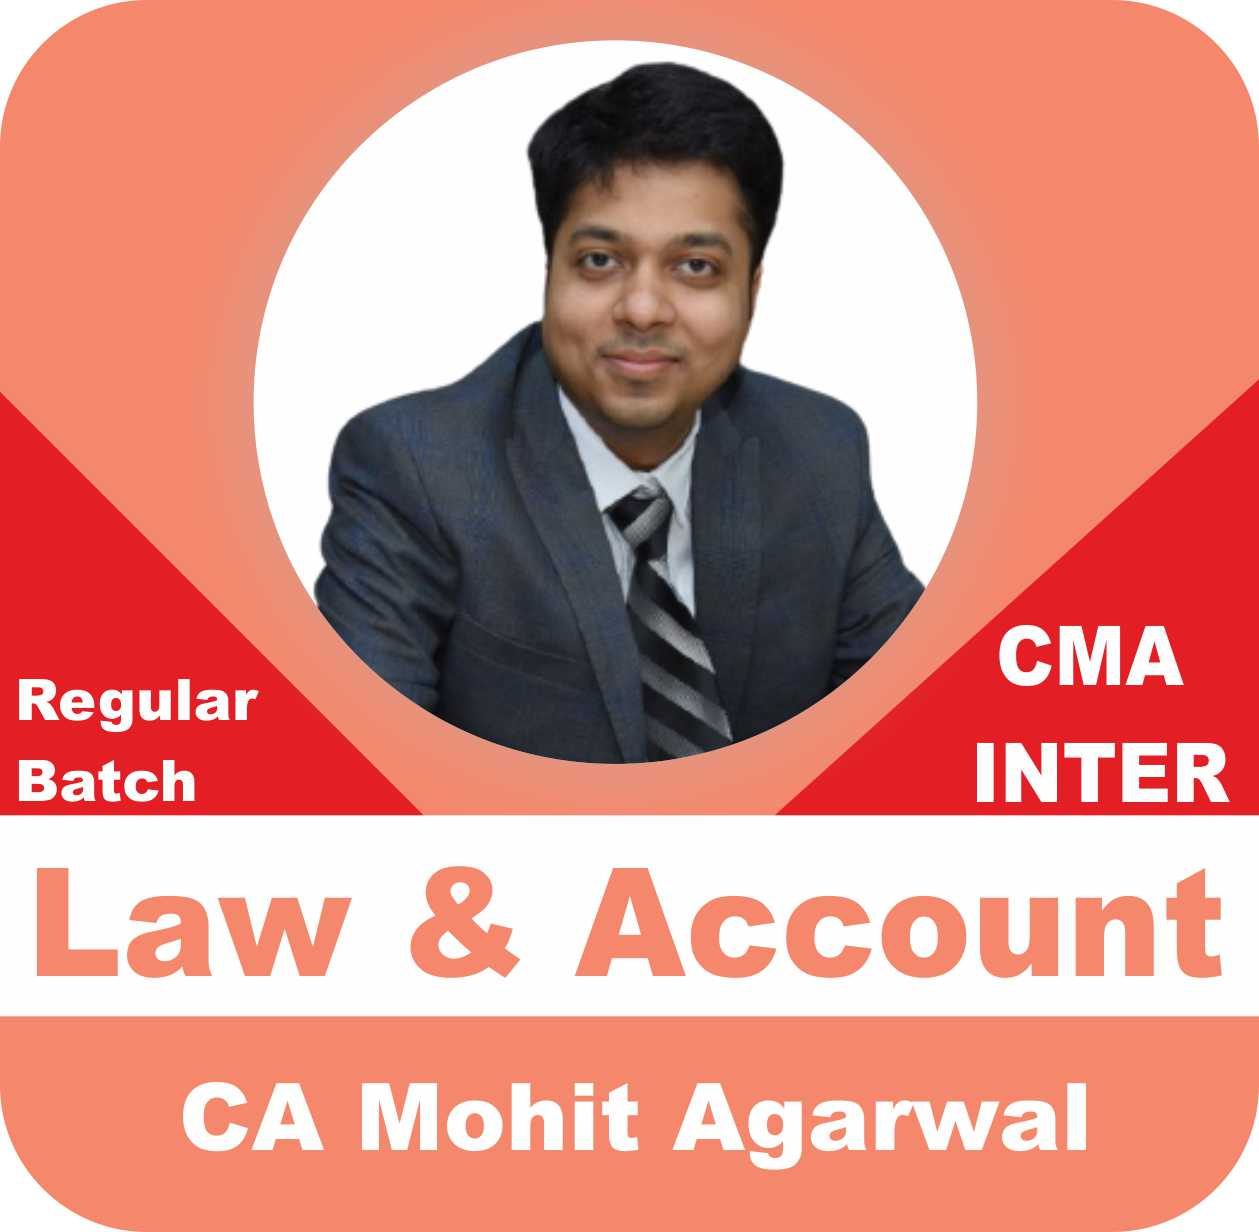 Law & Account Regular Batch Combo